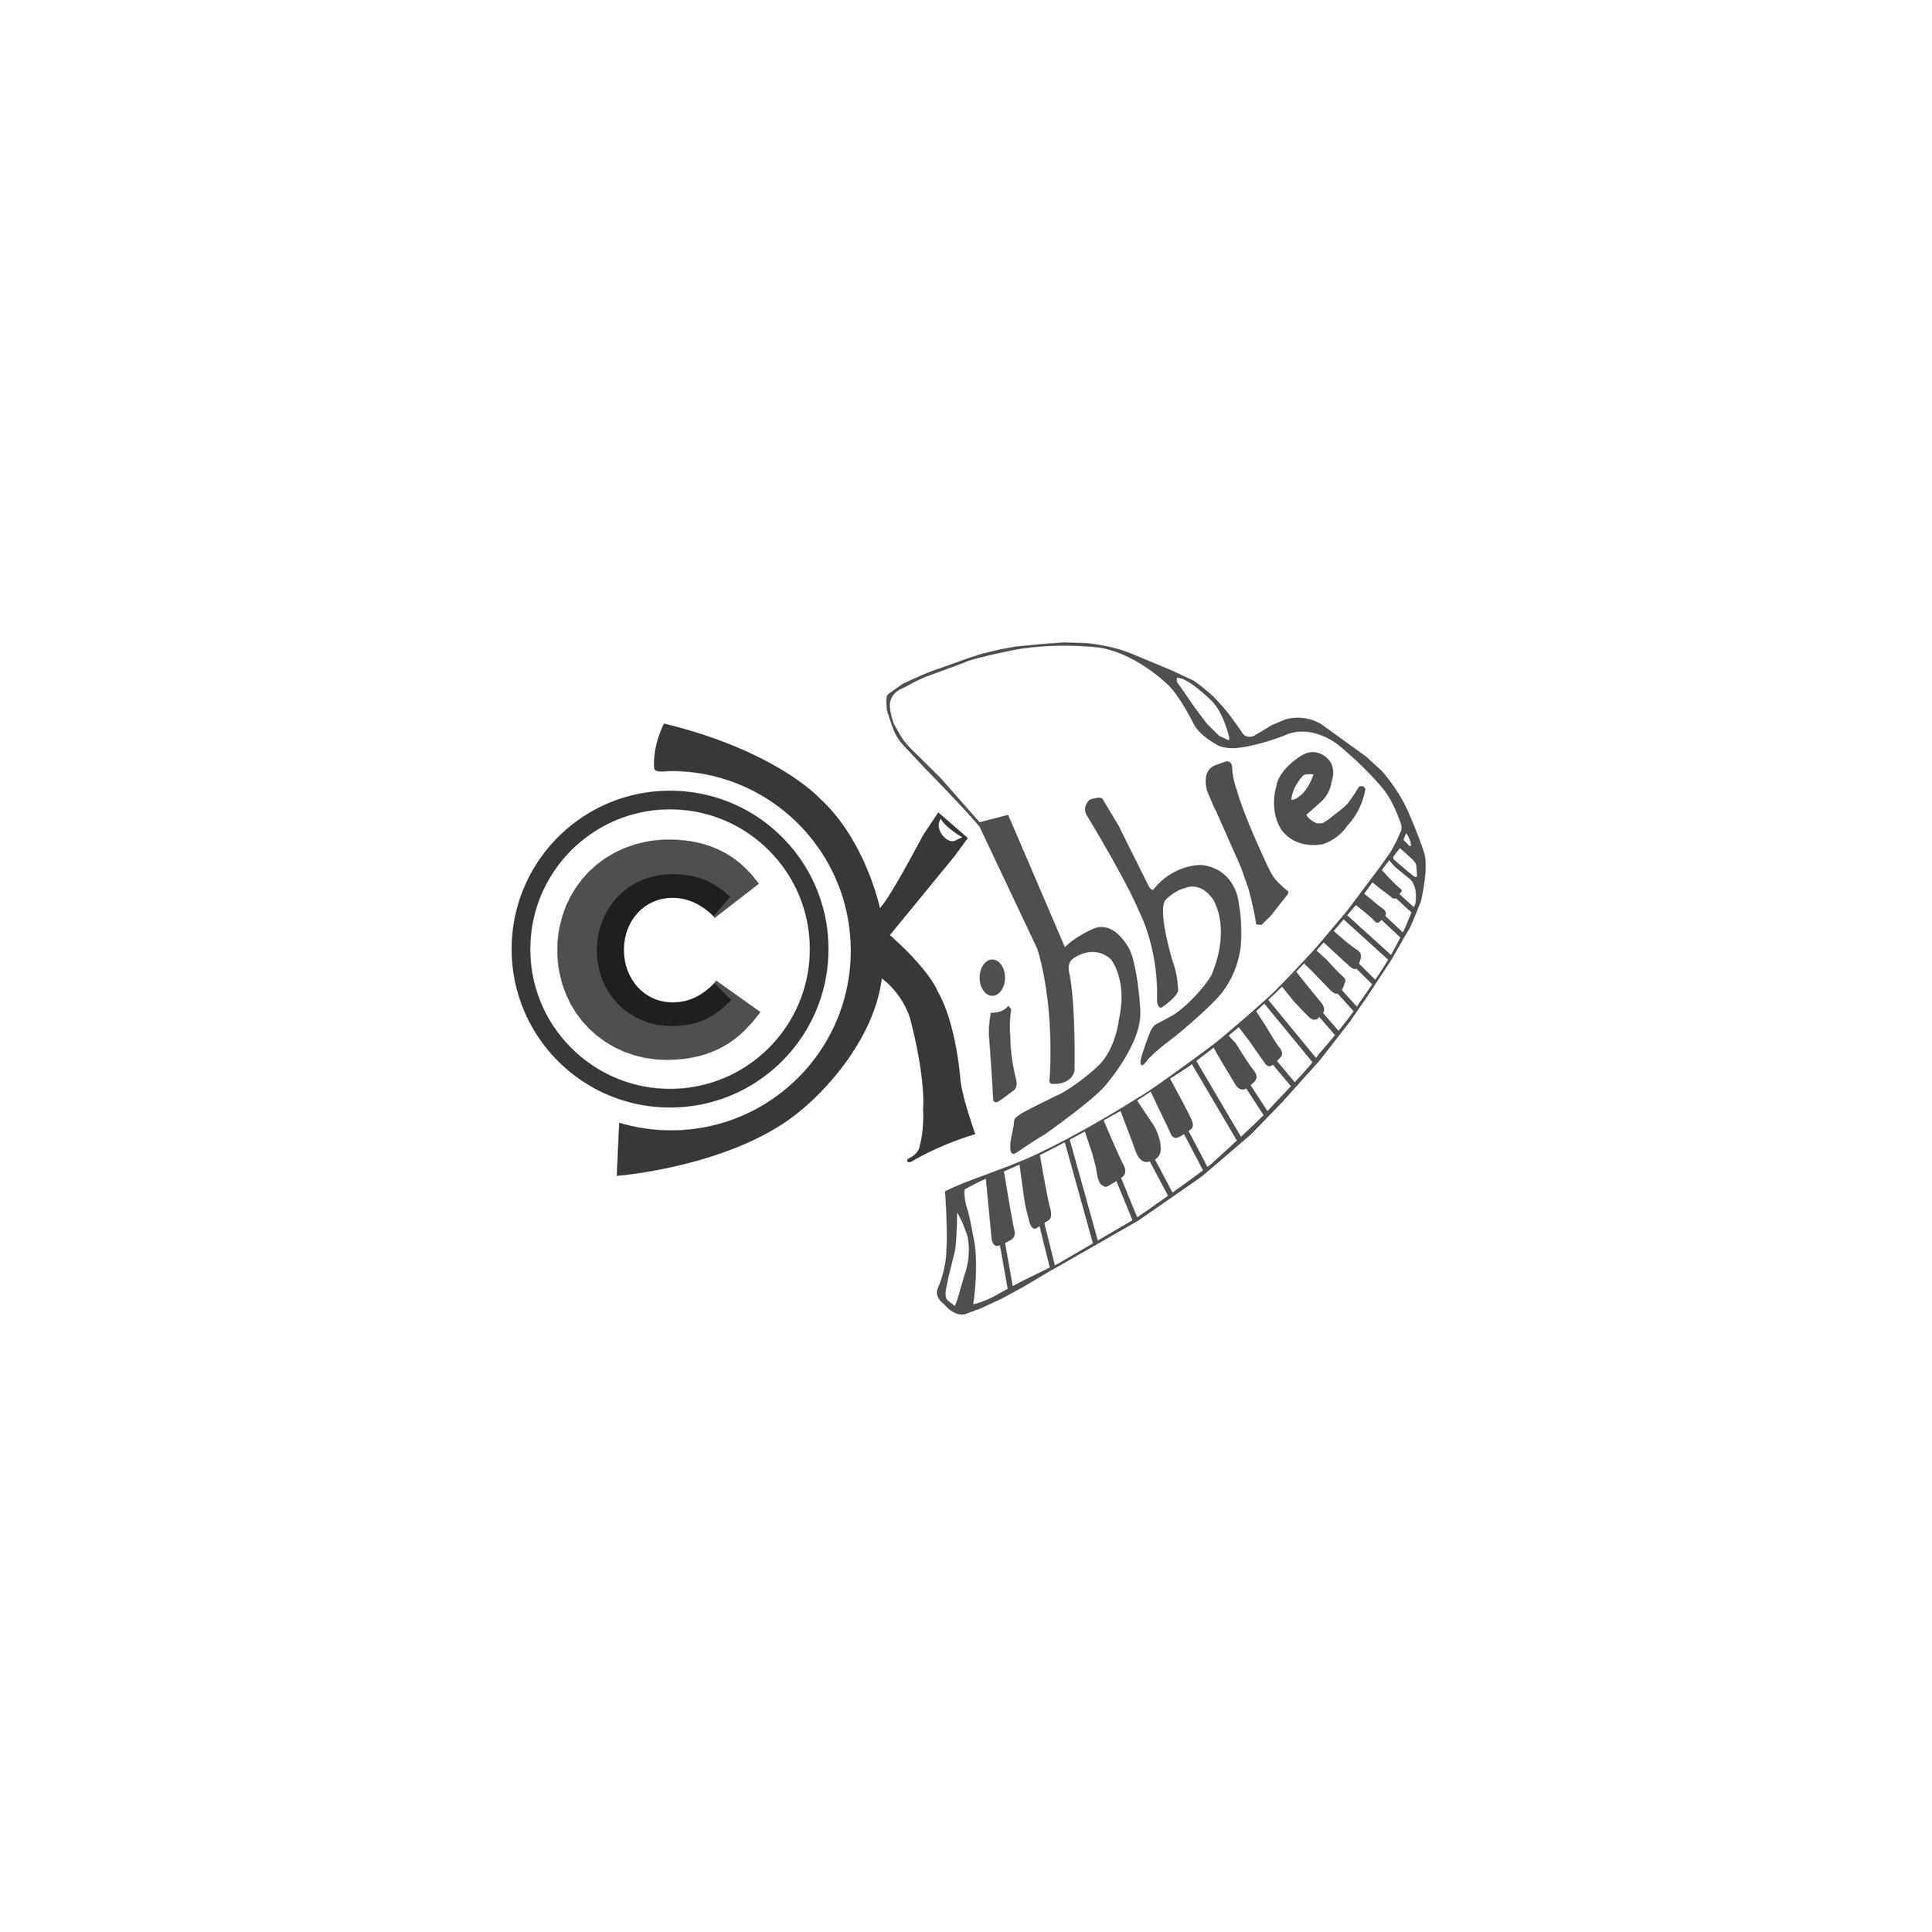 Kibble logo 300 jpeg.jpg